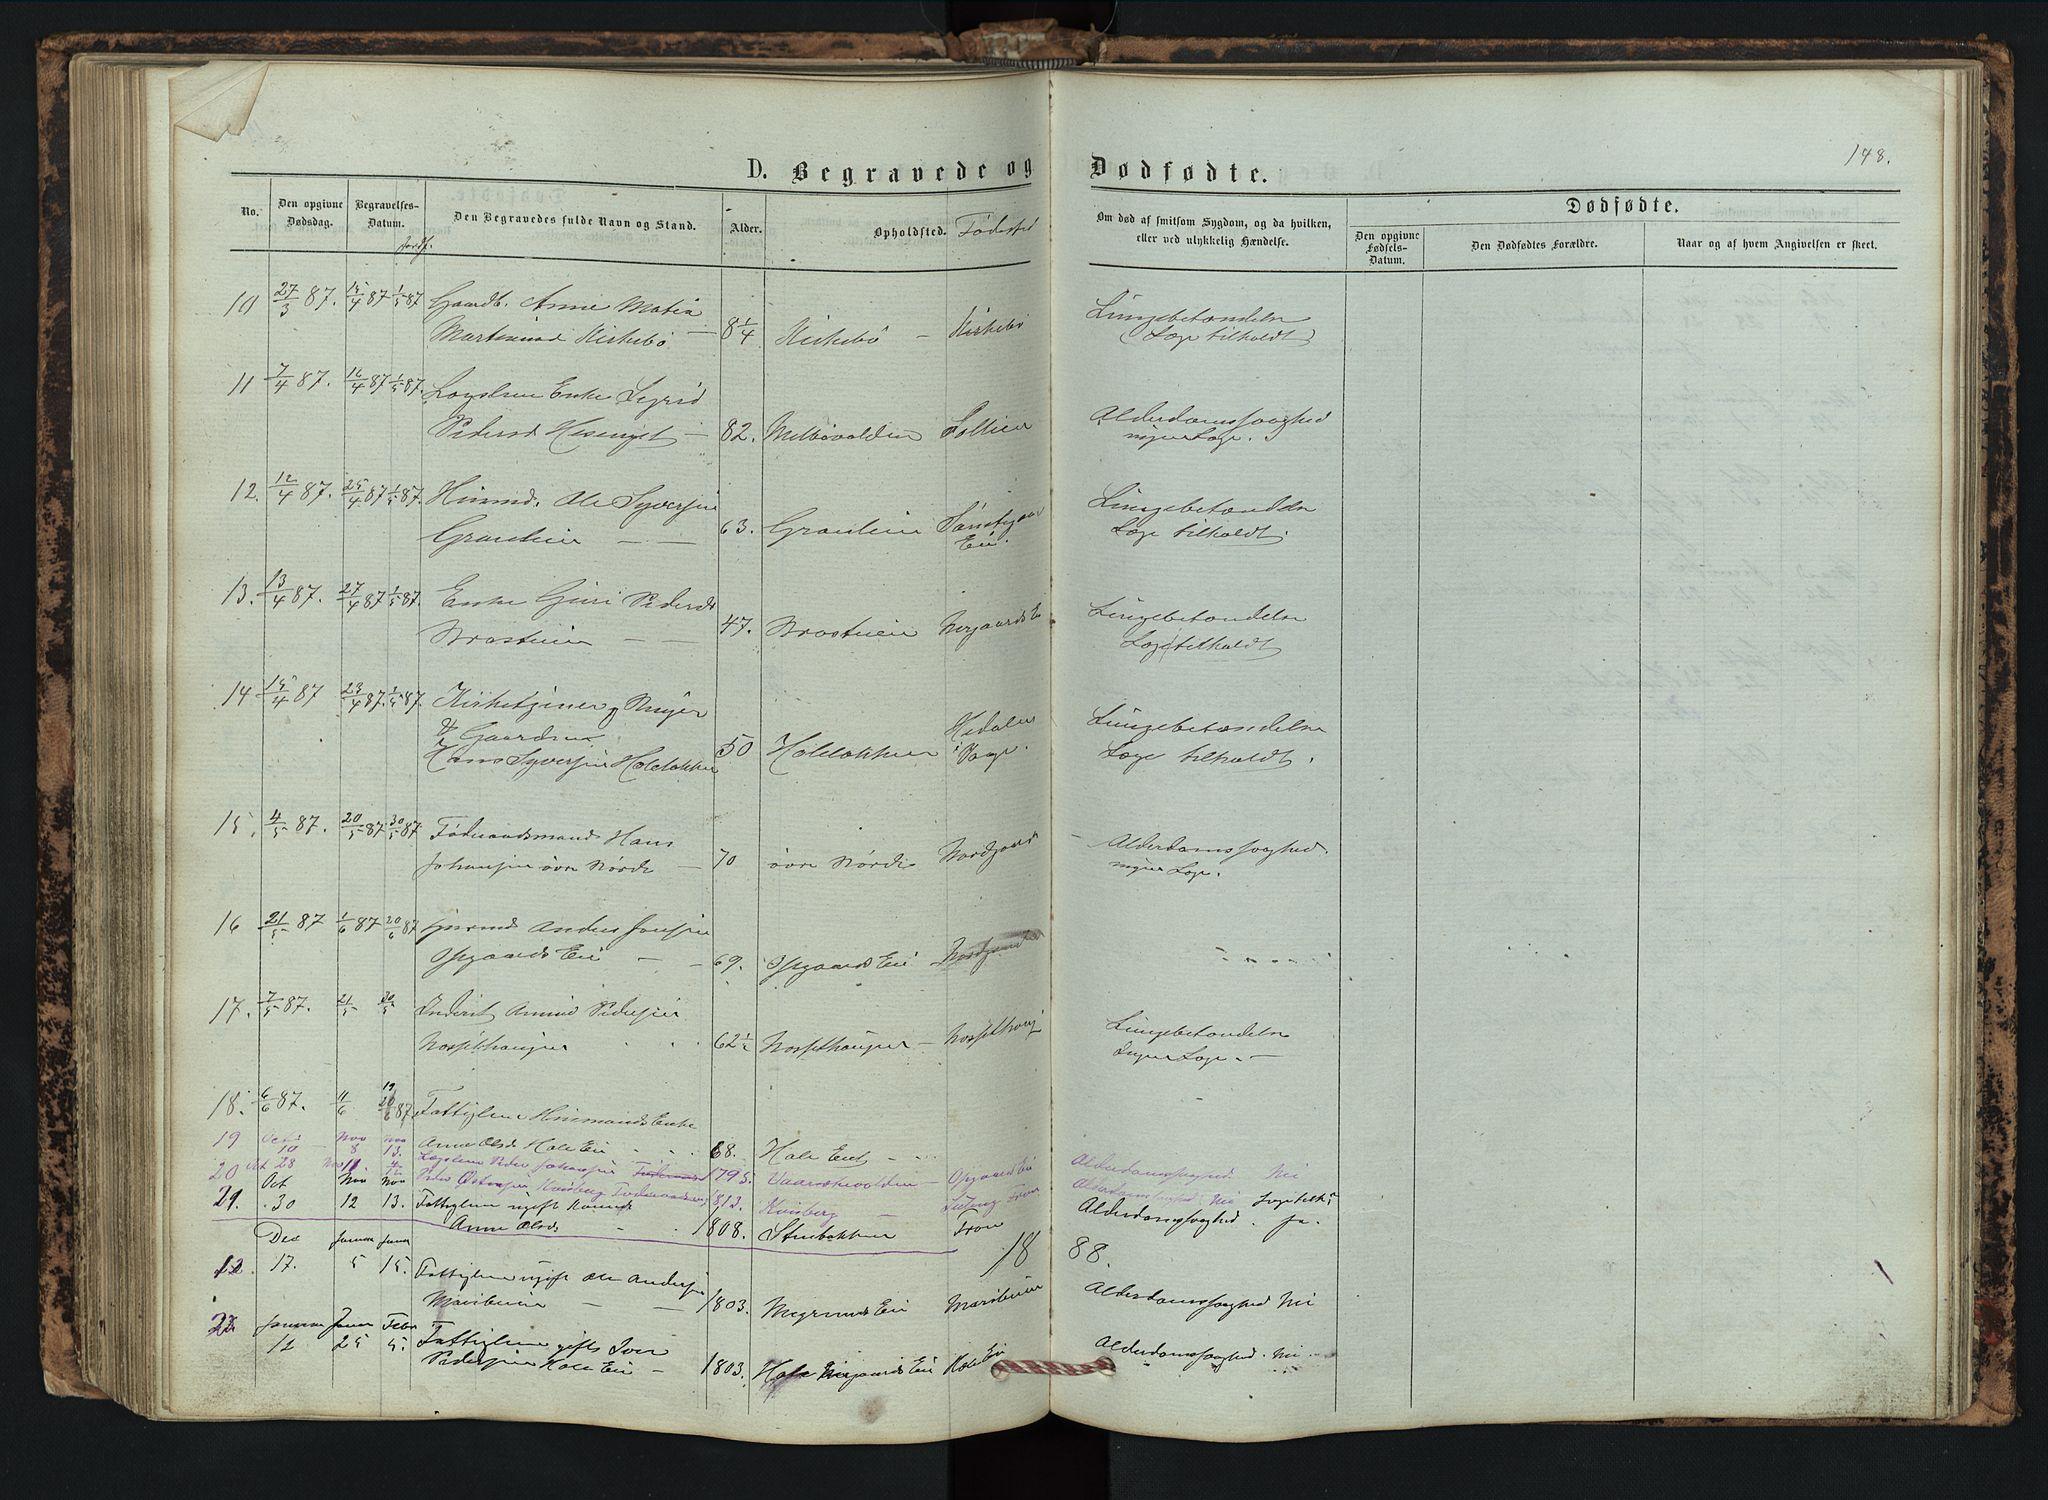 SAH, Vestre Gausdal prestekontor, Klokkerbok nr. 2, 1874-1897, s. 148